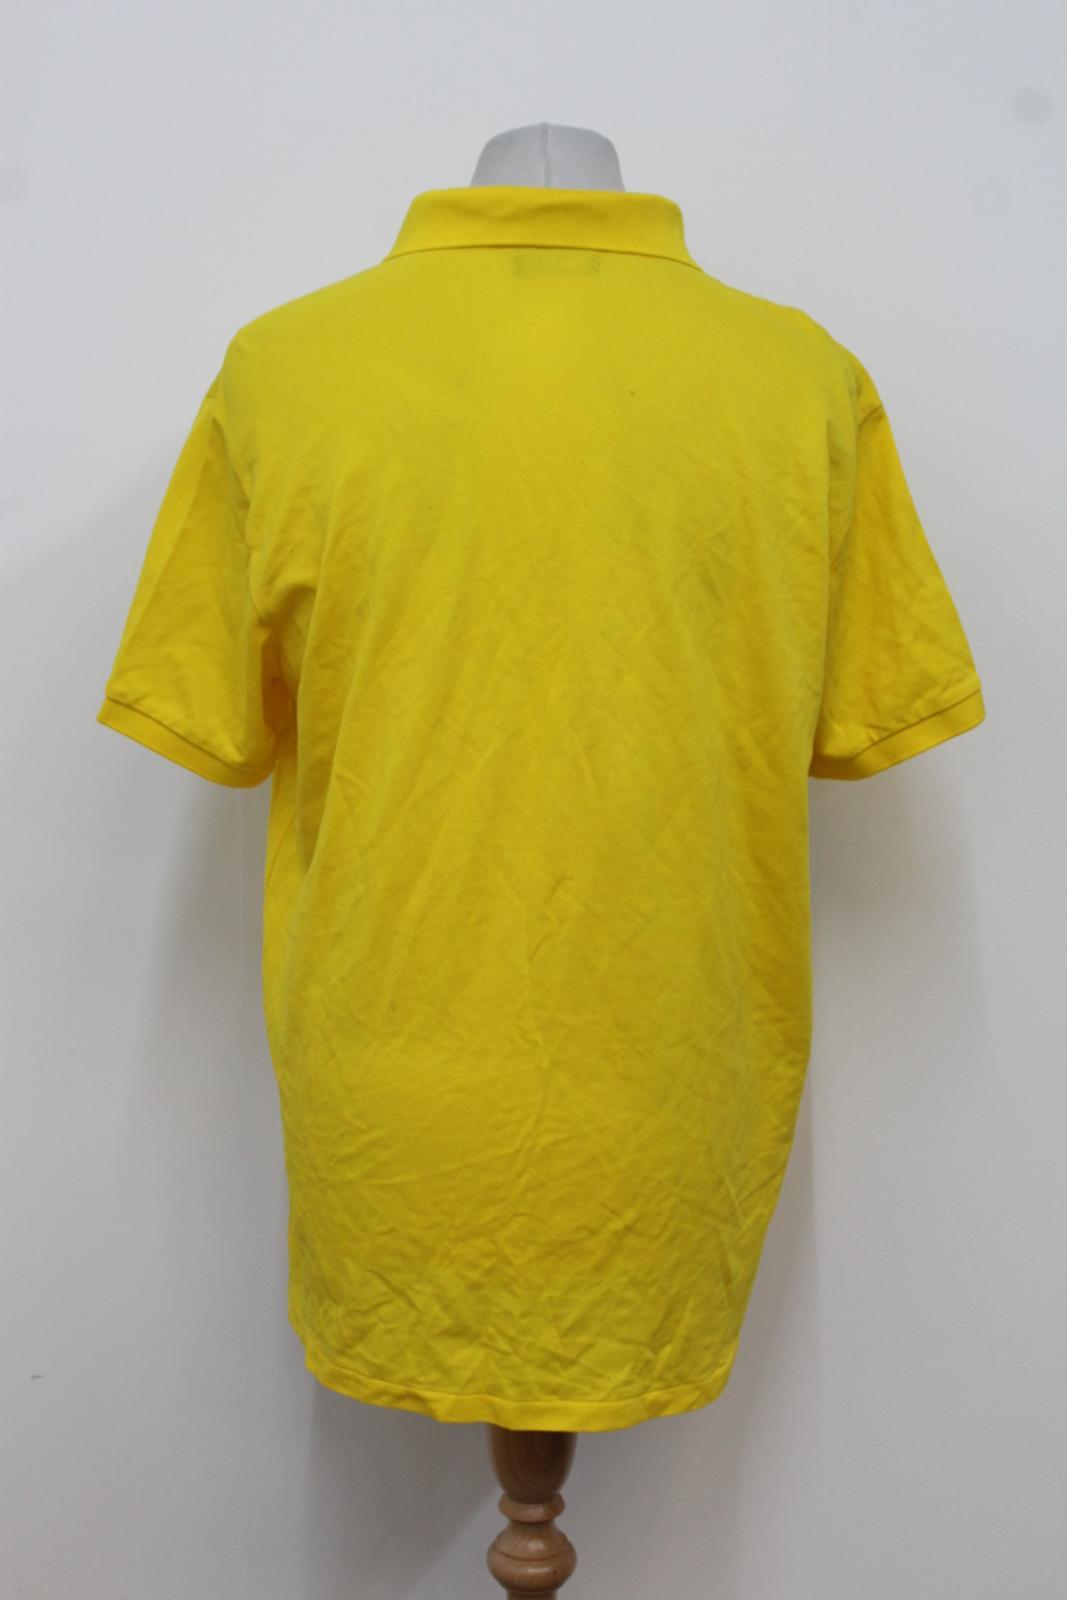 Ralph-Lauren-Polo-para-hombre-de-Amarillo-De-Algodon-Manga-Corta-Camisa-Polo-De-Ajuste-Personalizado miniatura 4